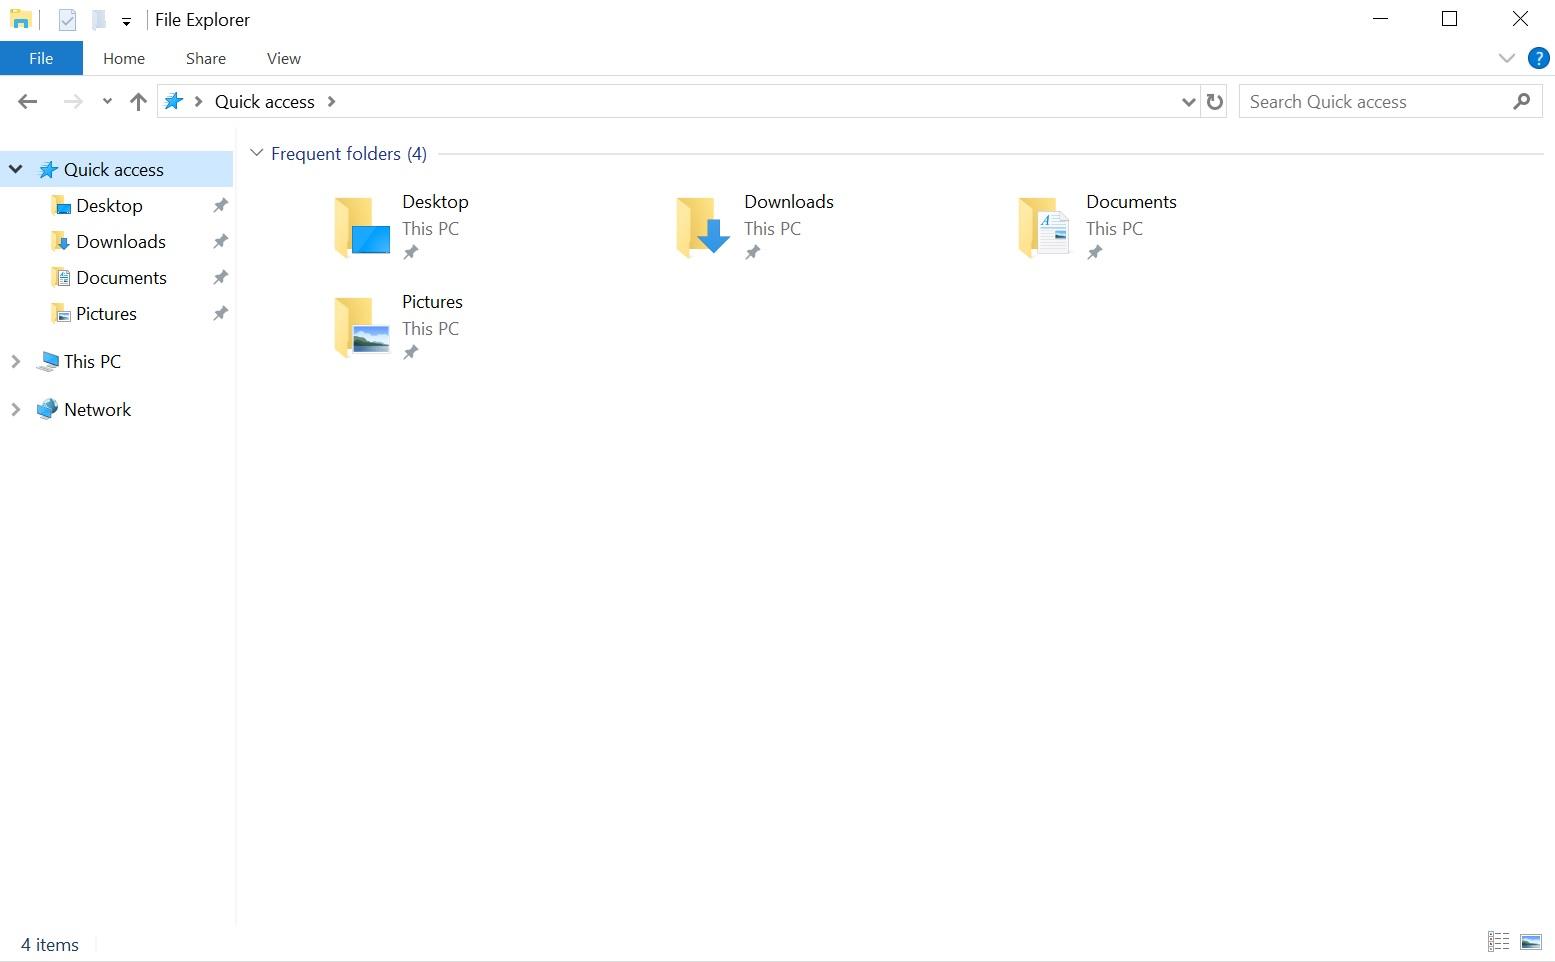 windows 10 october 2018 update download file